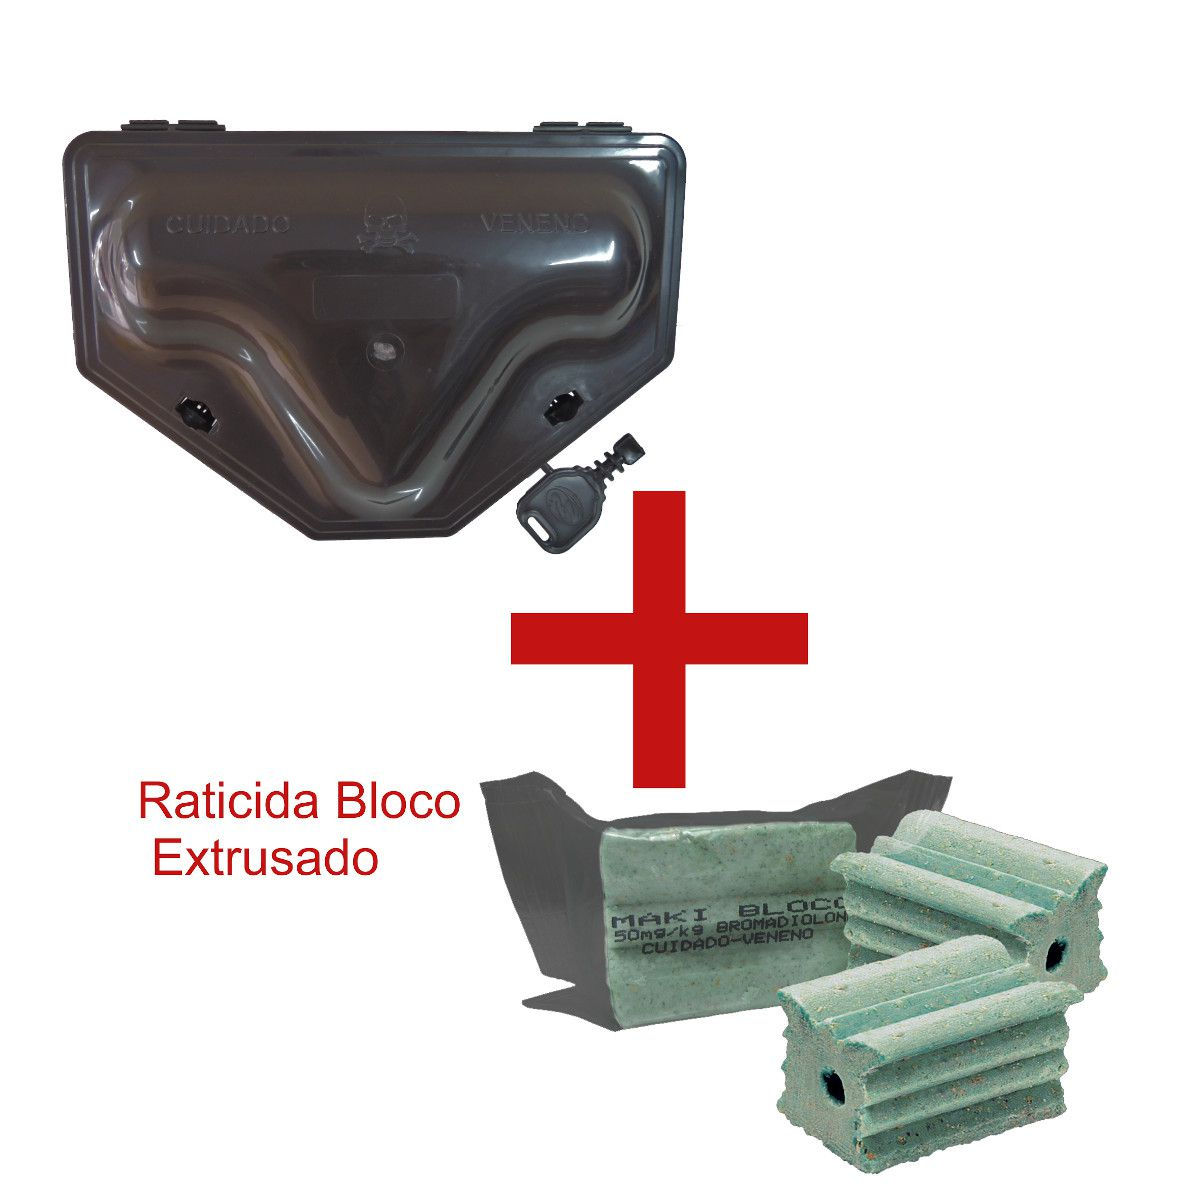 KIT 800 Armadilha Pega Rato Porta Iscas Forte 2 TRAVAS Chave